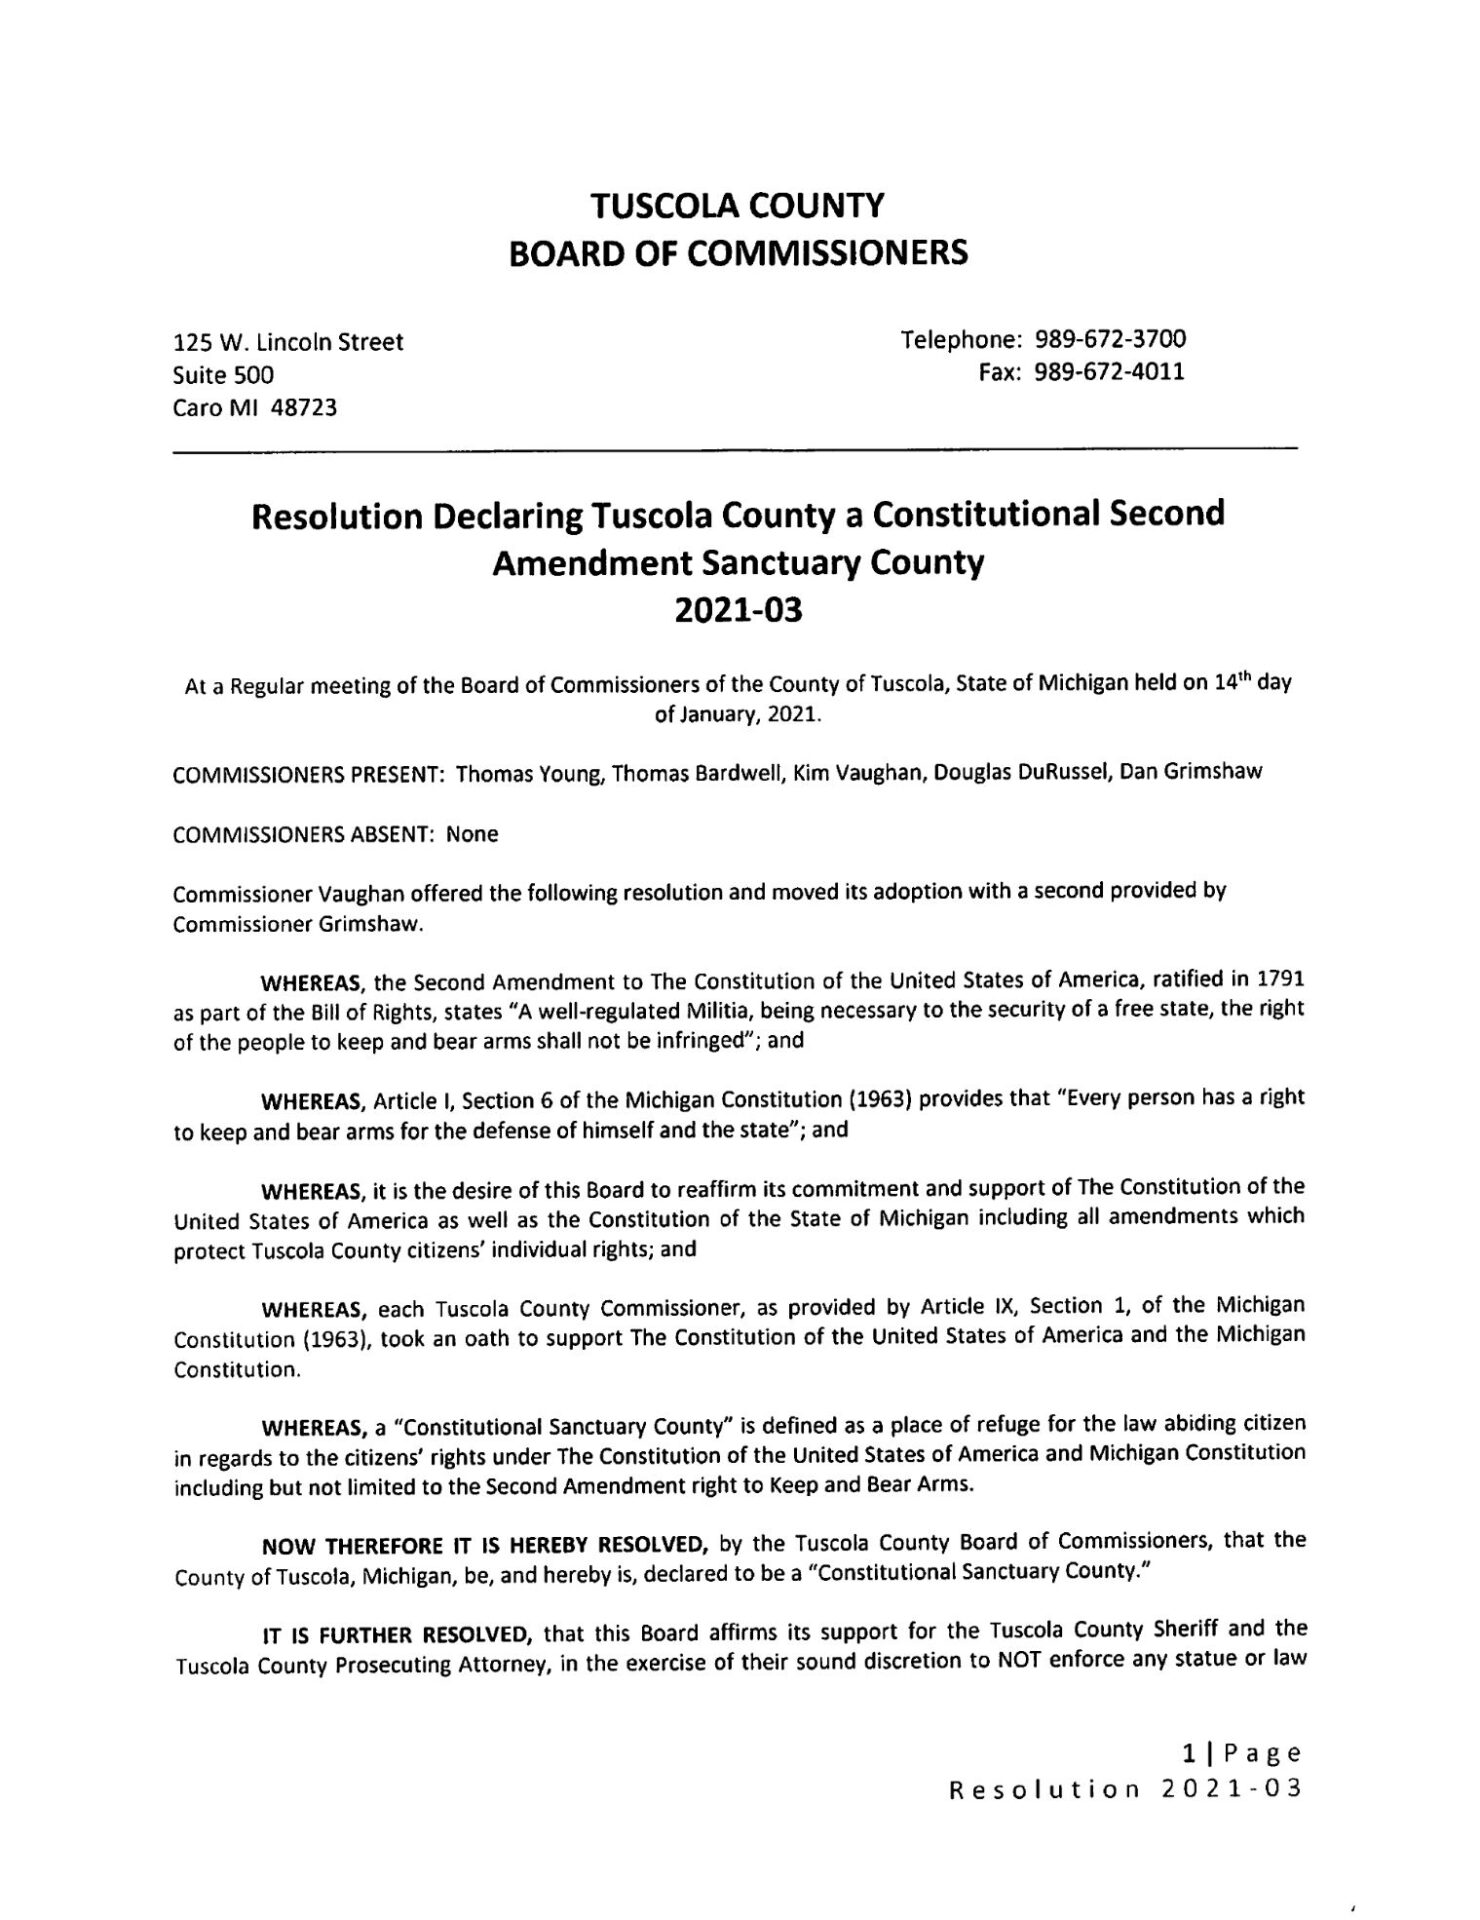 Tuscola County Constitutional Second Amendment Sanctuary Resolution pg 1